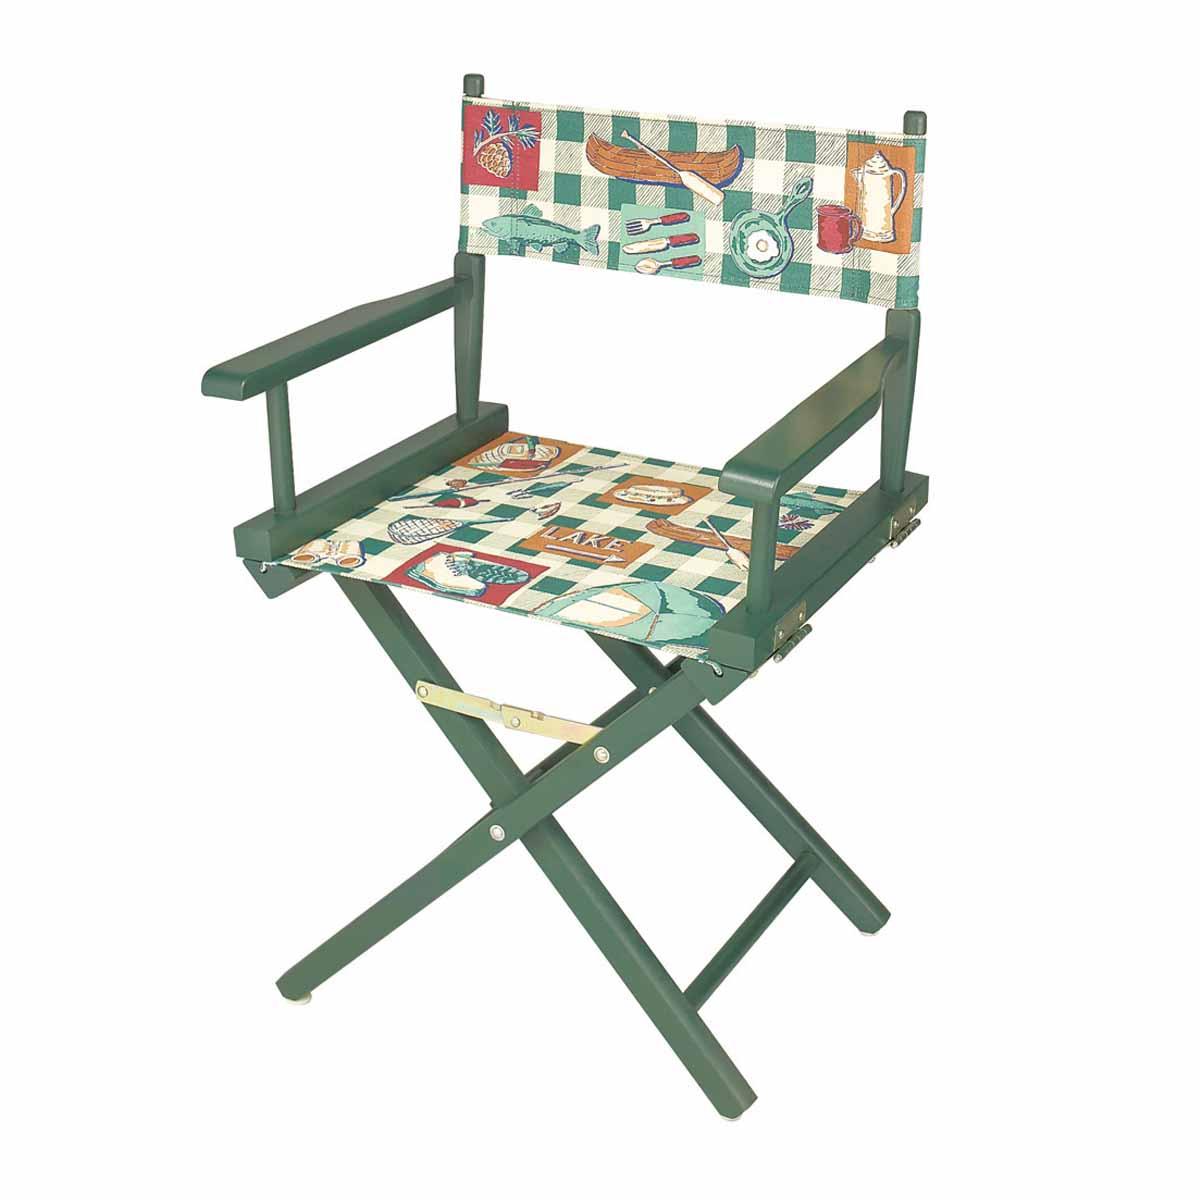 Pleasant Folding Chairs Cotton Wood Folding Chair 33 5 8H X 22W Creativecarmelina Interior Chair Design Creativecarmelinacom